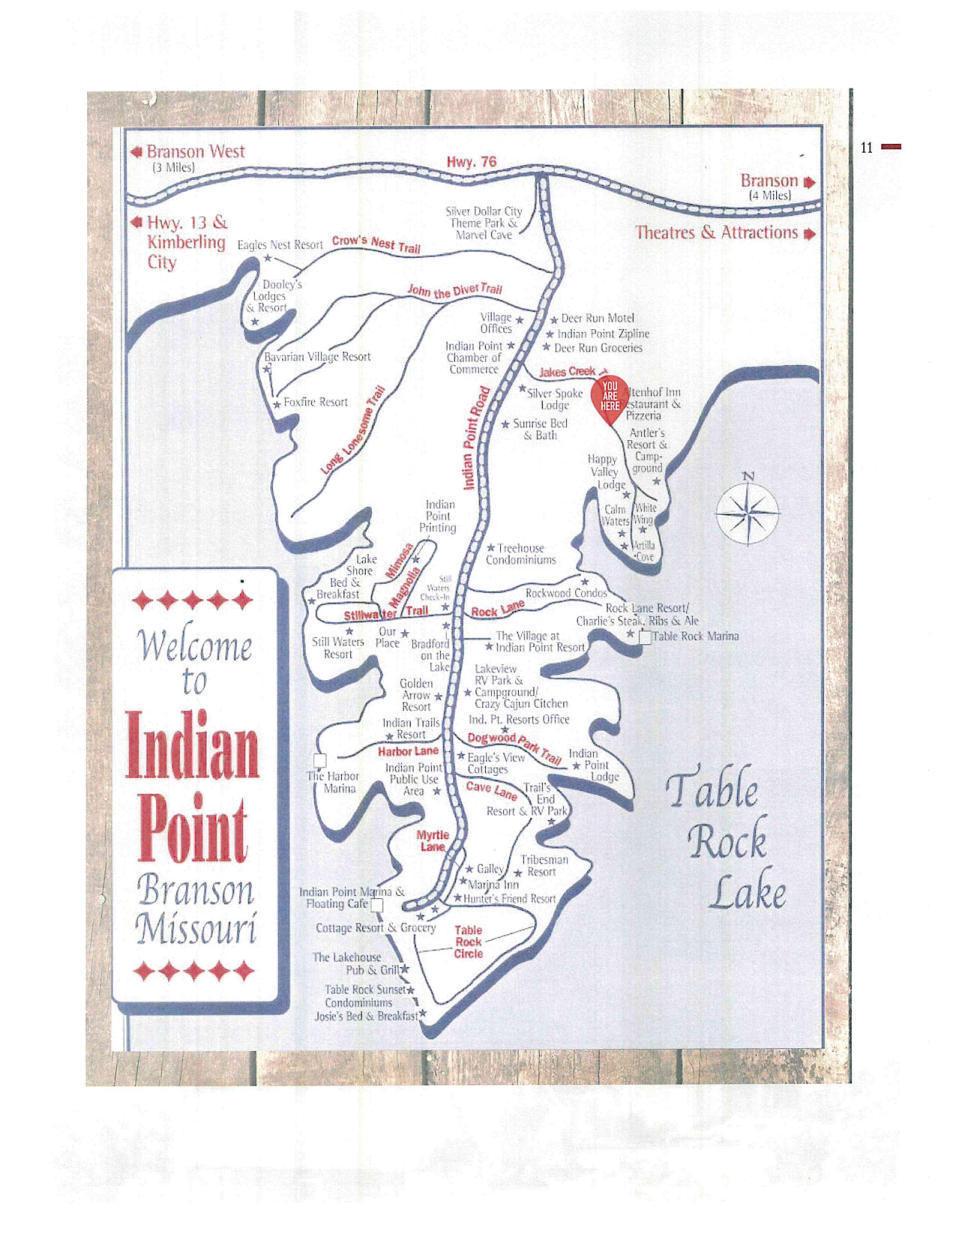 45 David Shawn Drive Indian Point, MO 65616